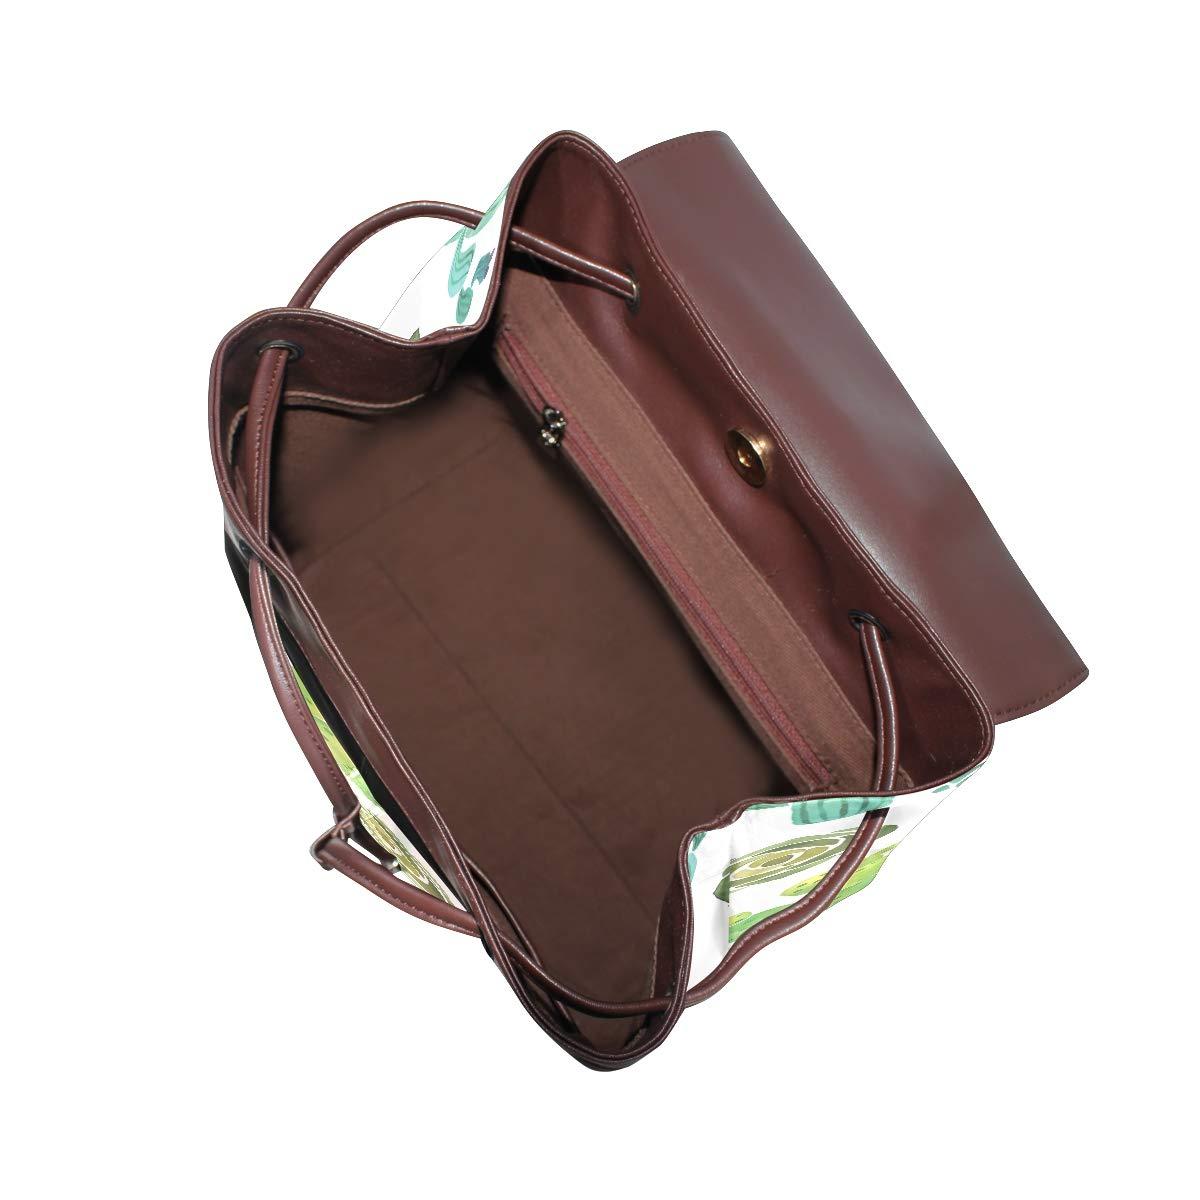 PU Leather Shoulder Bag,Watercolor Cactus Succulent Backpack,Portable Travel School Rucksack,Satchel with Top Handle